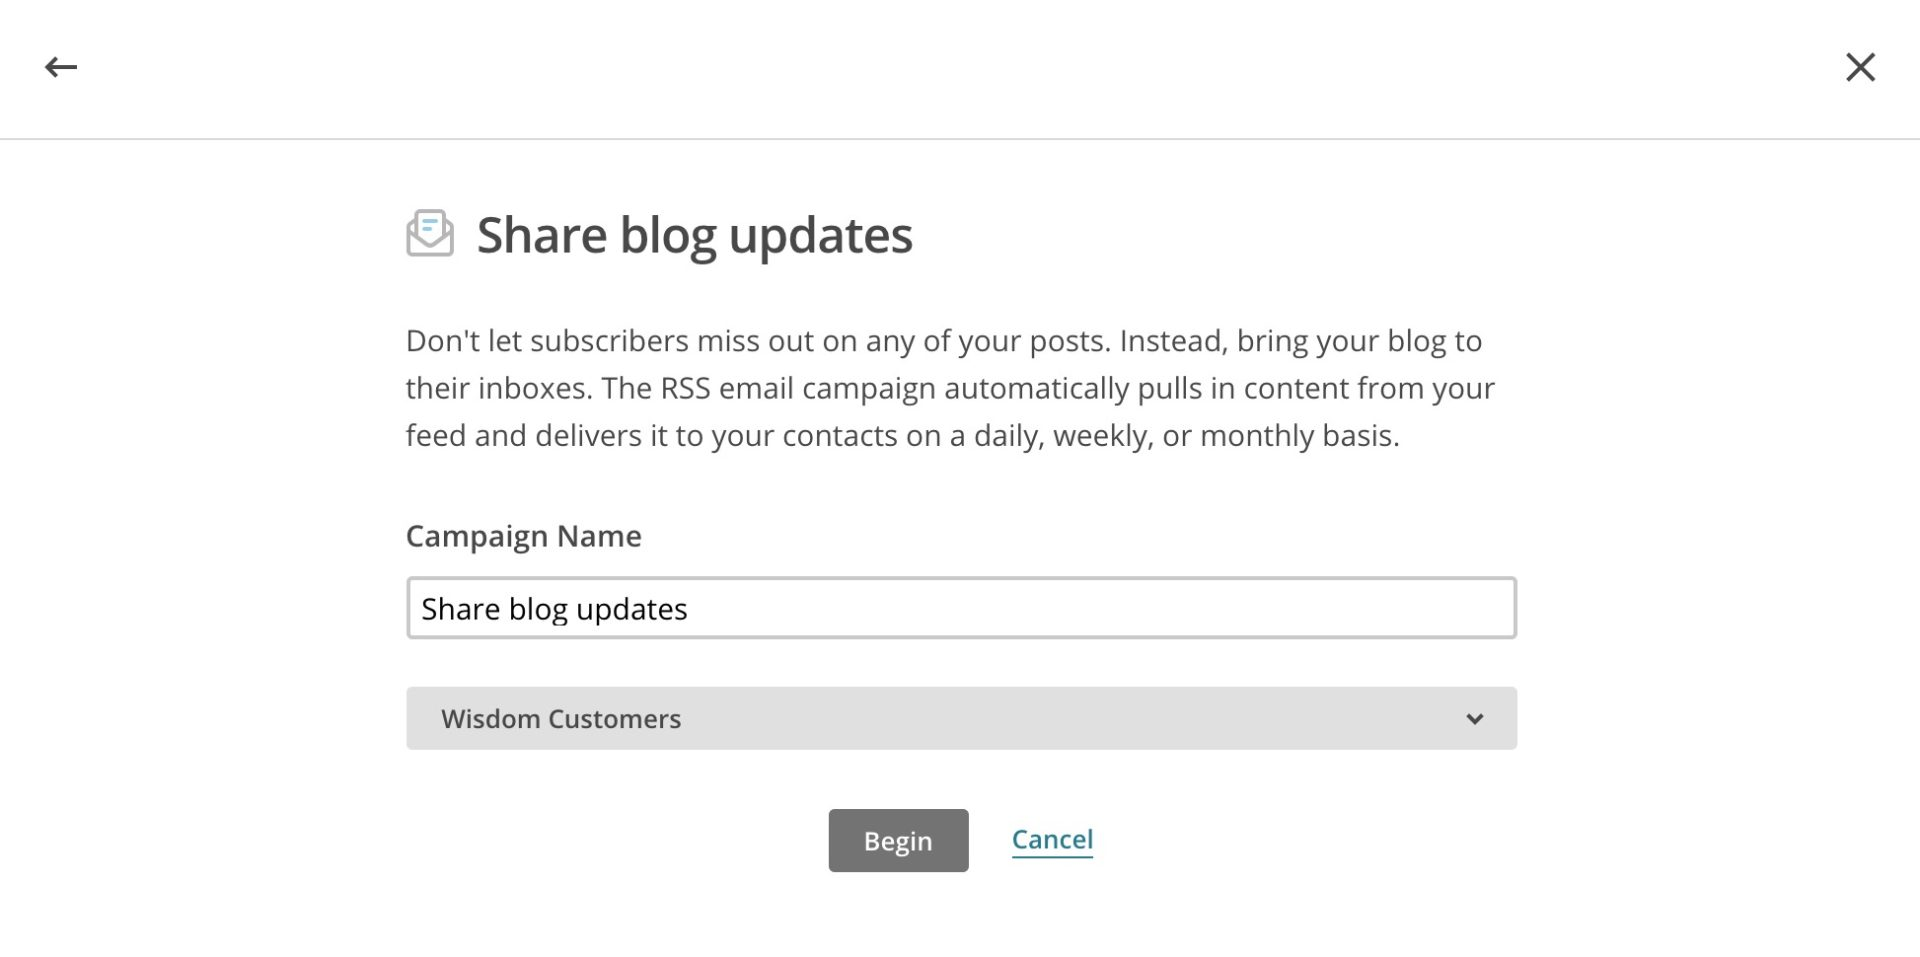 Share blog updates